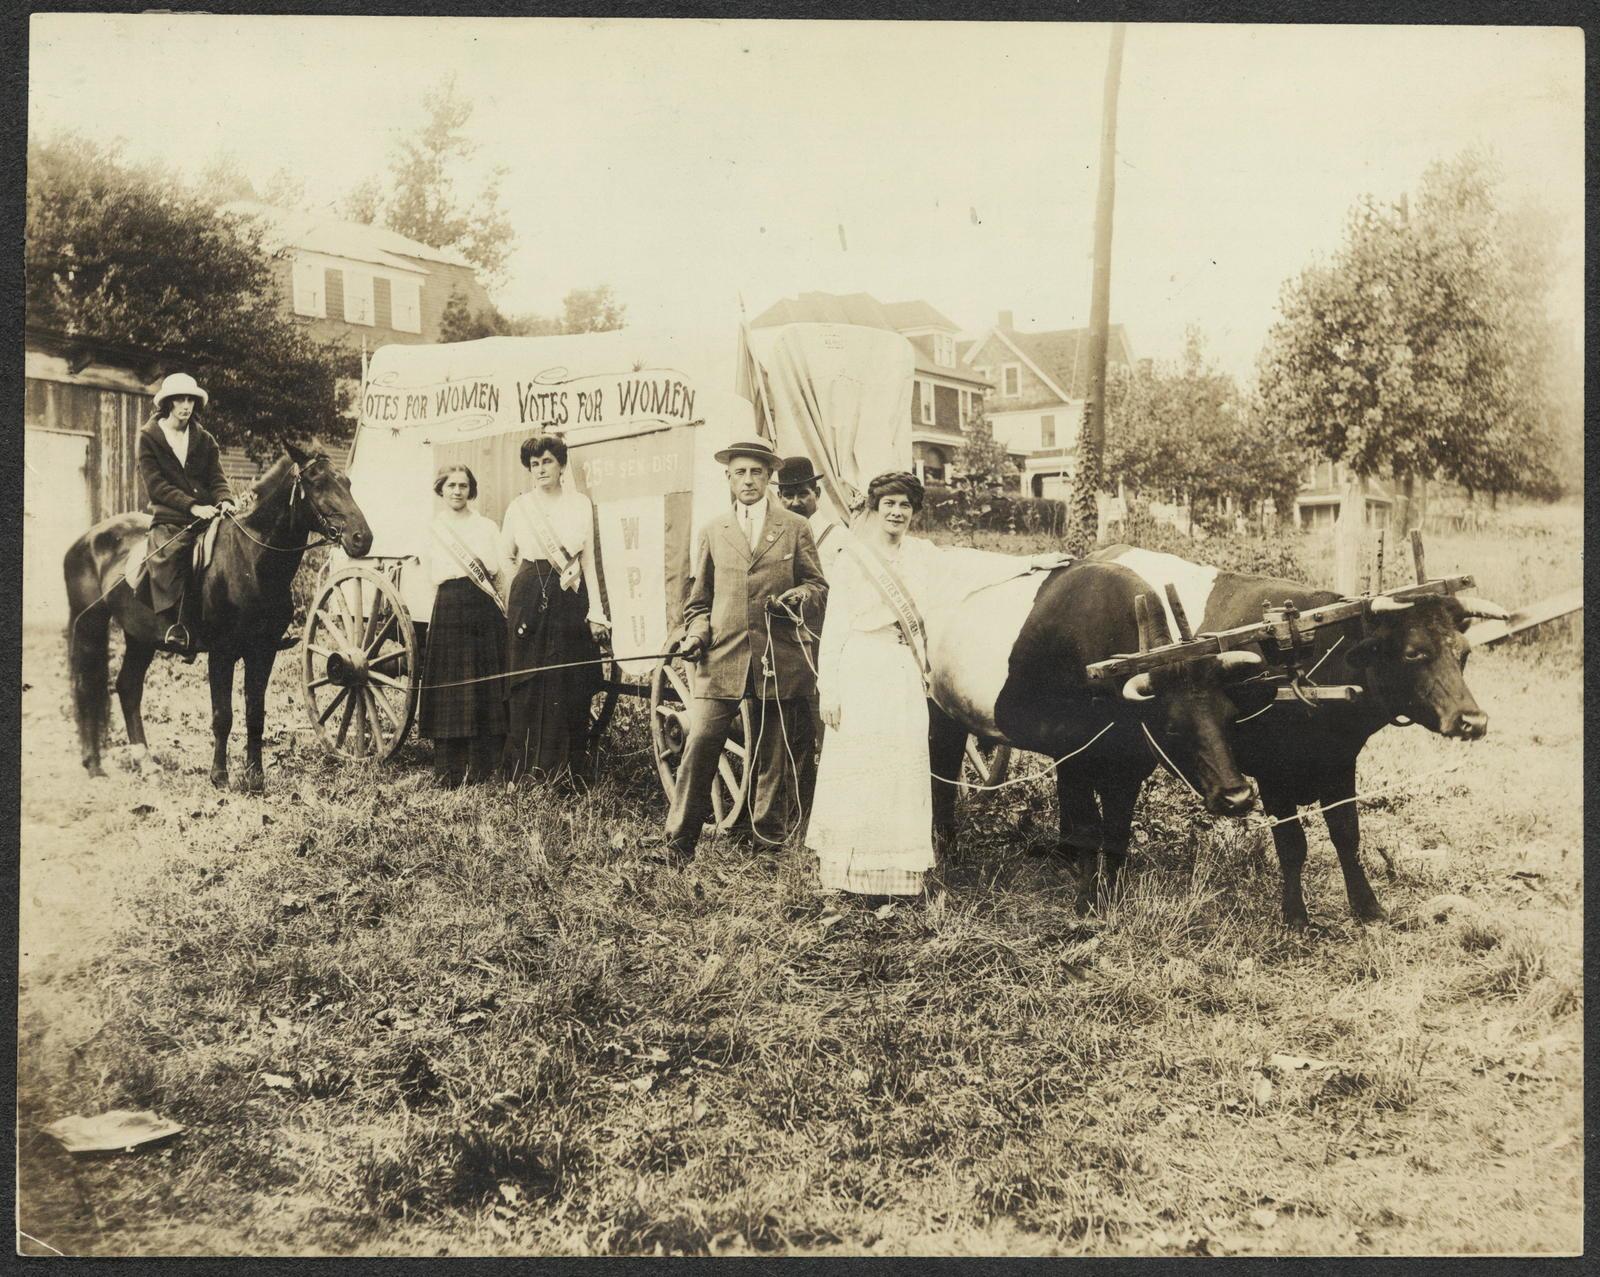 Women's Political Union delegation, Western New York, ca. 1910-1915. Phyllis Miller, [W]igger [the] Horse, Ida Armquist, Elisabeth Worth Miller, Jack McGee, Alfred Thompsen, Elisabeth Freeman, Teddy & Taft [the] Oxen.